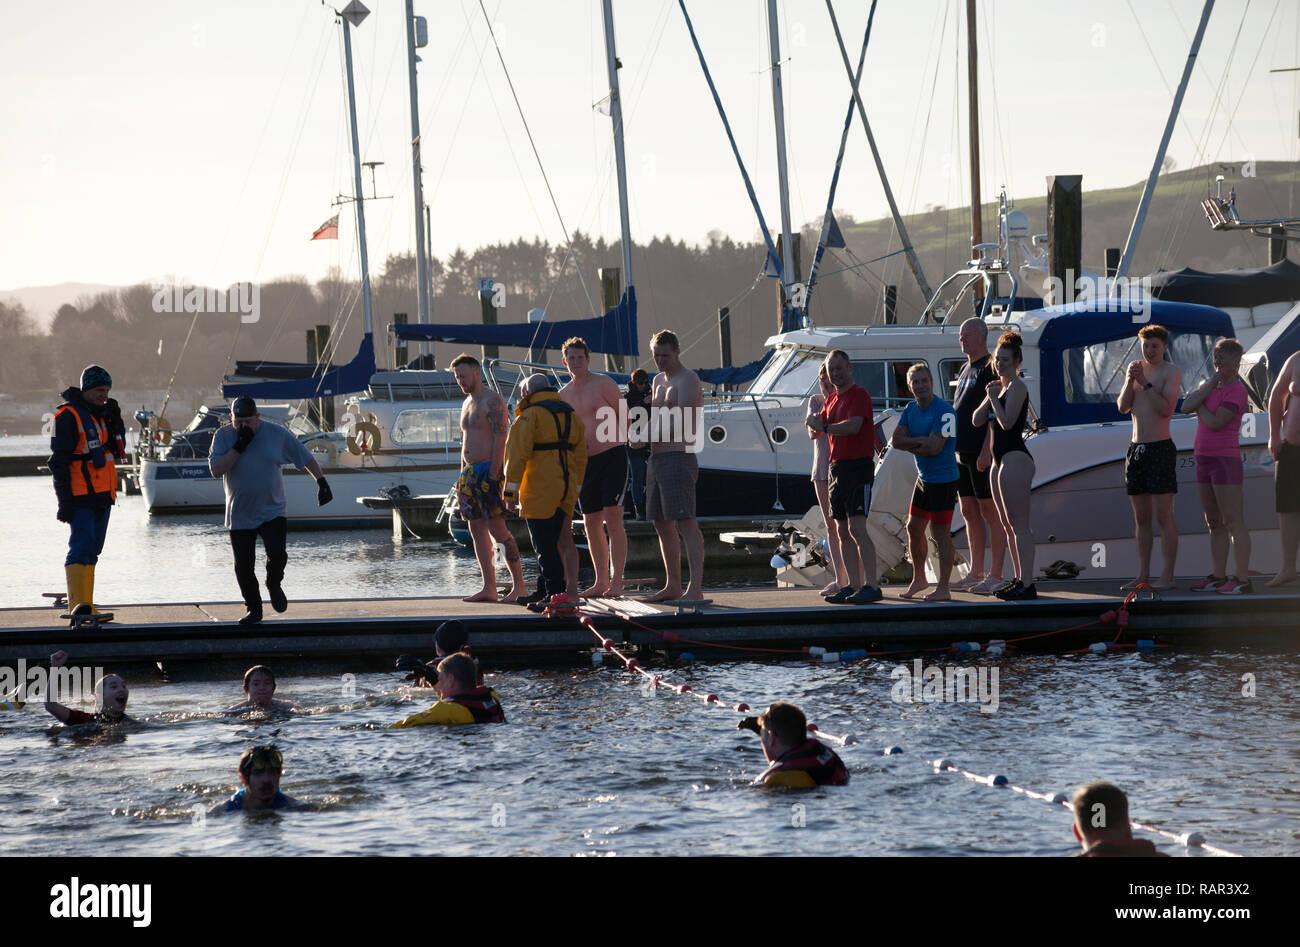 People taking part in the New Year's Swim at Rhu Marina, Scotland - Stock Image